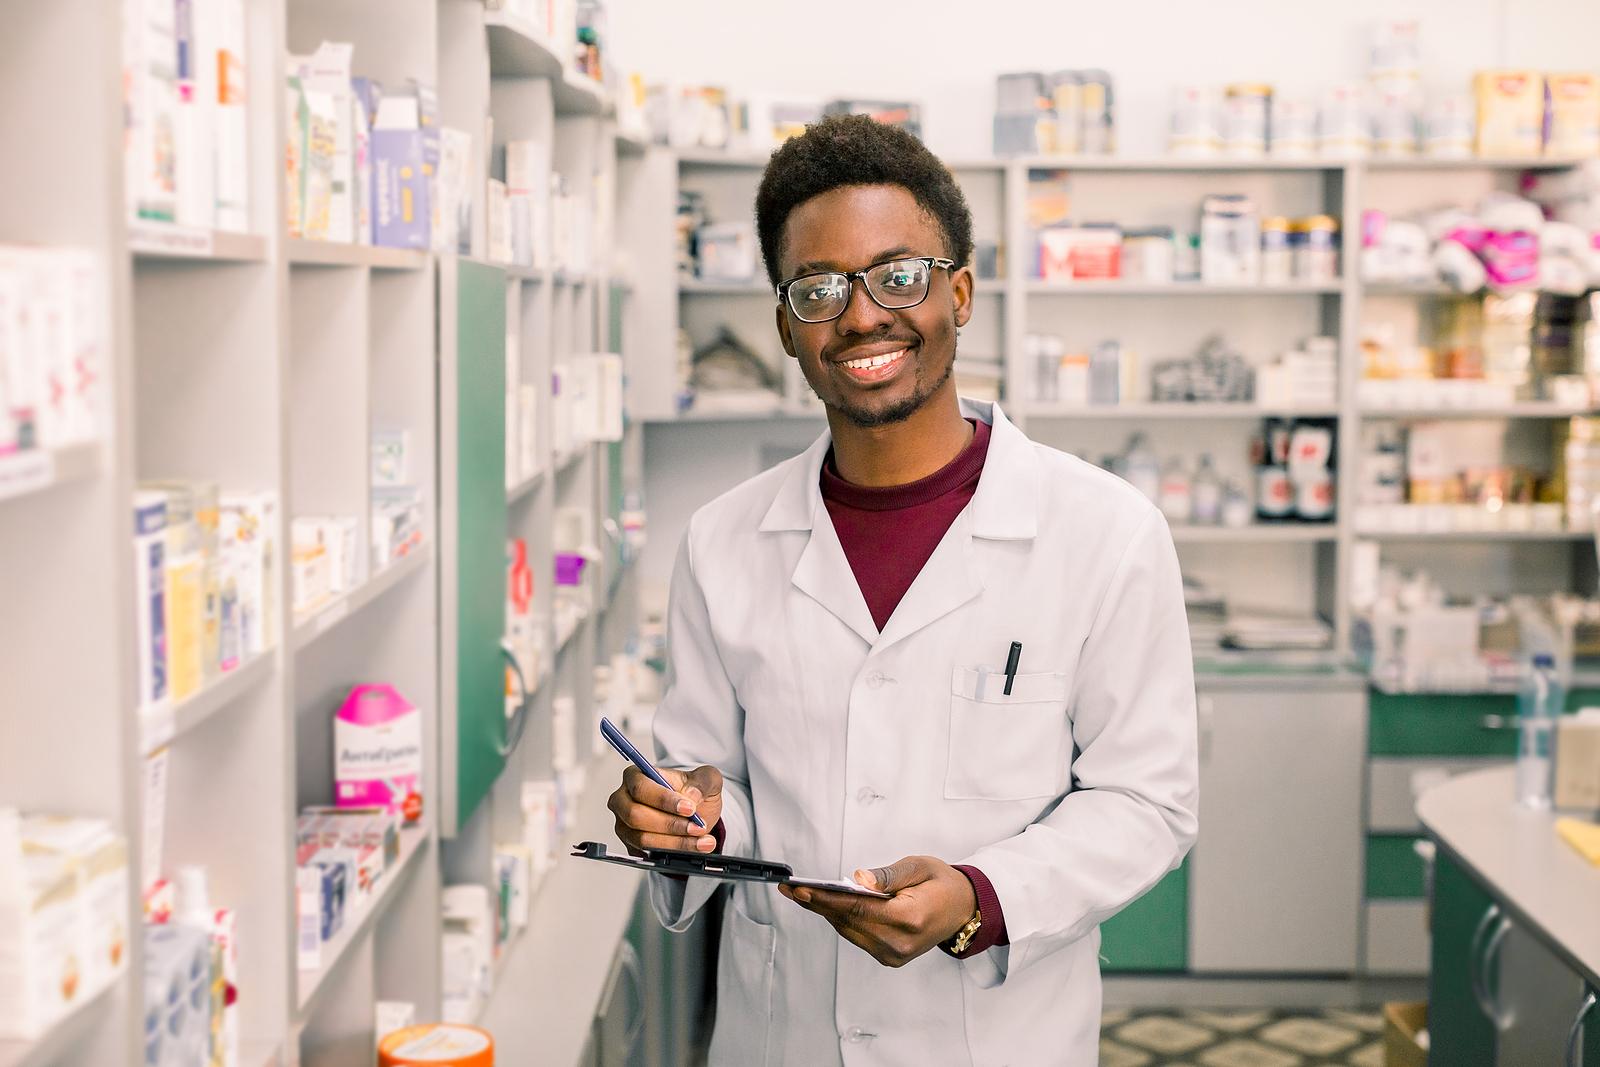 Pharmacy technician holding clipboard in pharmacy.